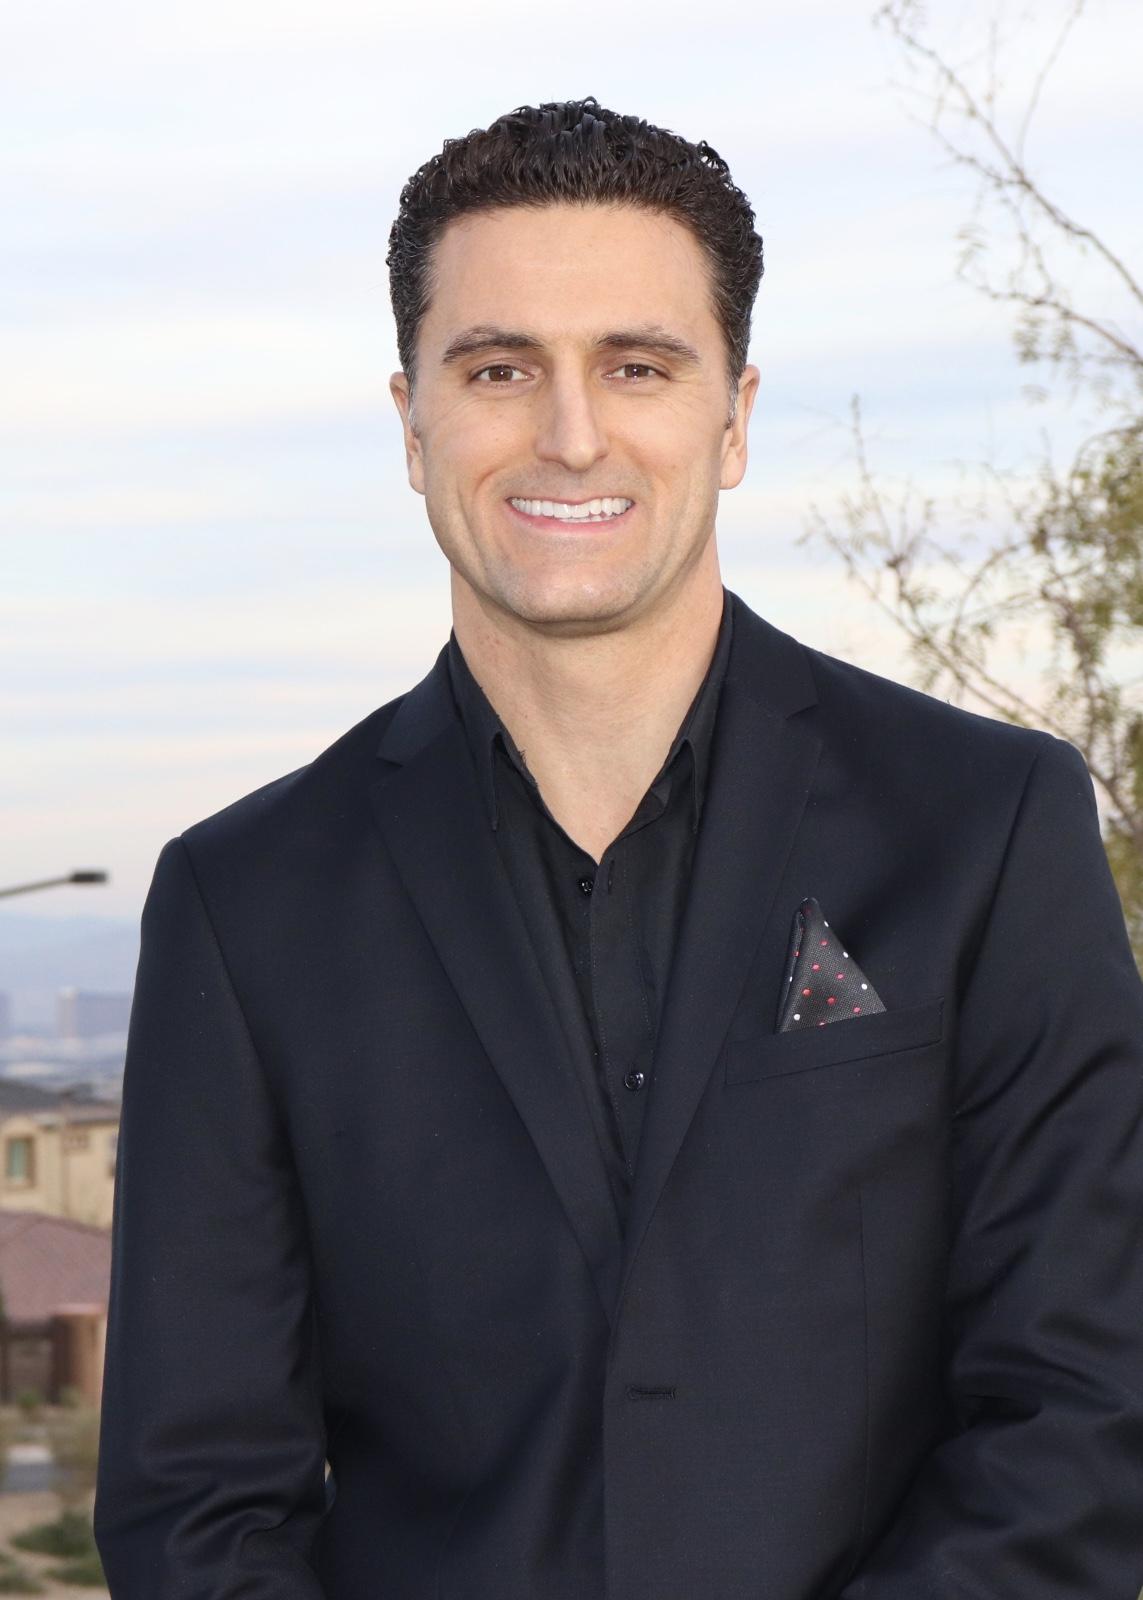 profile image of James Condino, REALTOR